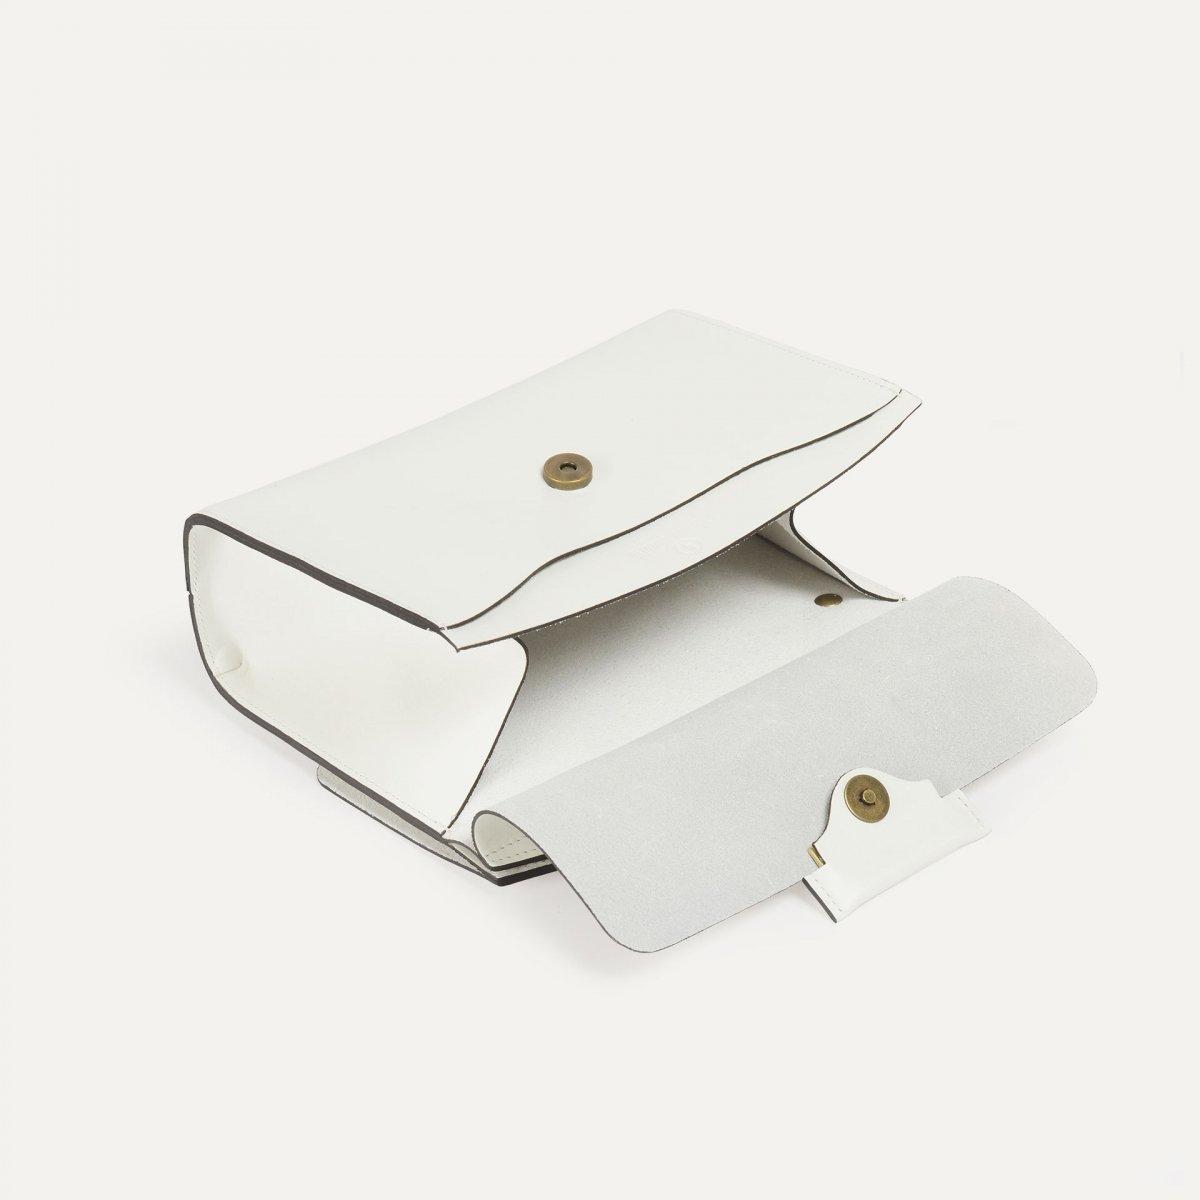 Origami S clutch bag - White (image n°4)